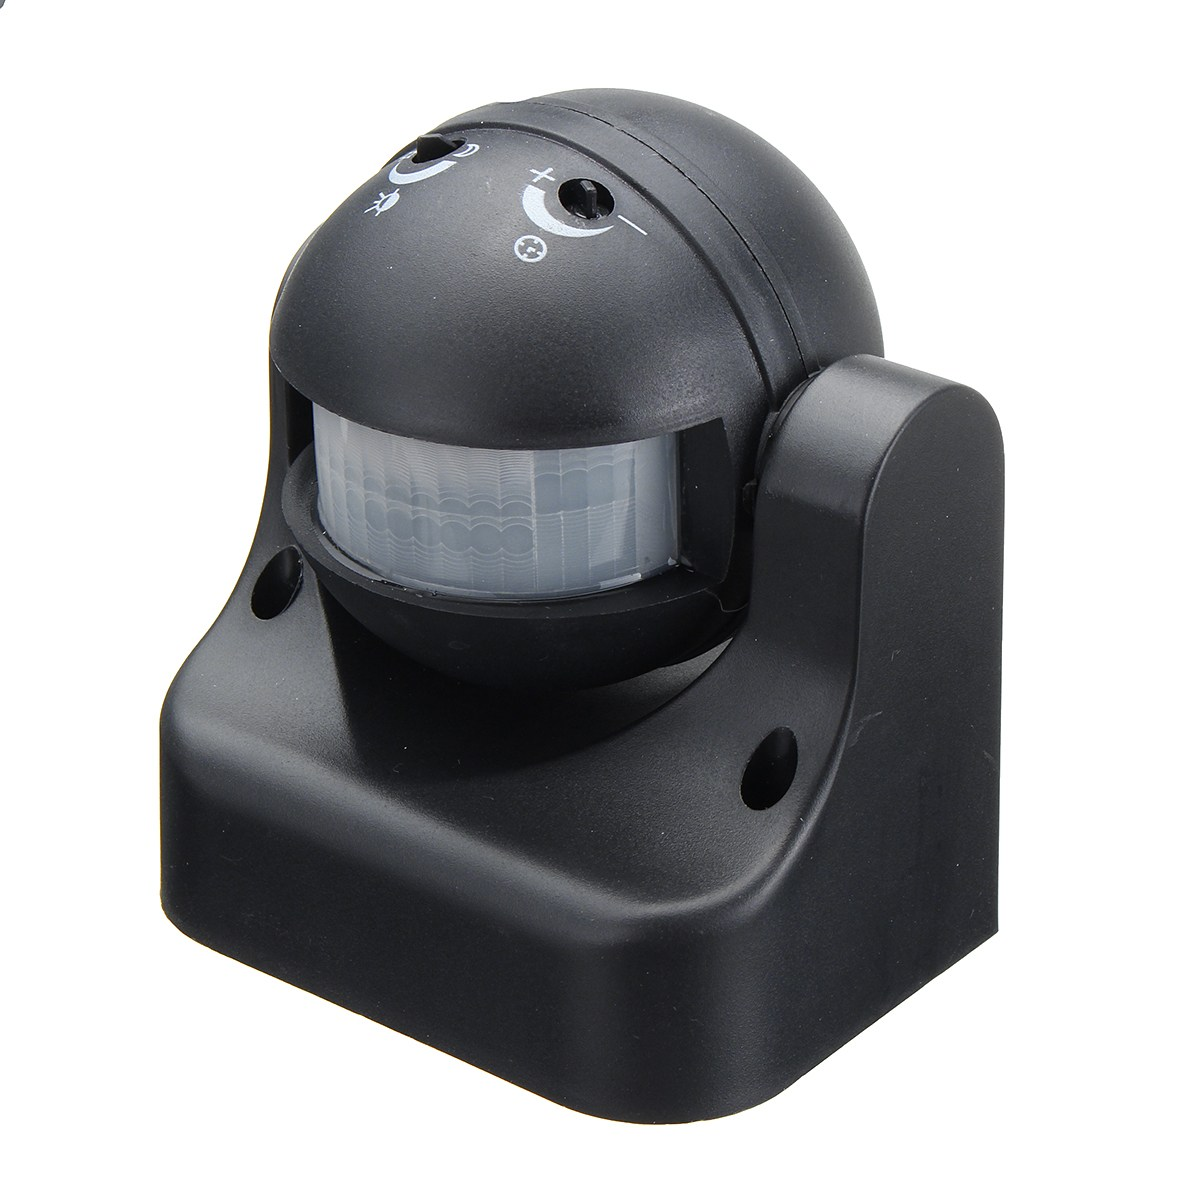 NEW Safurance AC110V-240V Outdoor Human Body Infrared Detector Motion Sensor Switch Black Home Automation new safurance ac110v 240v outdoor human body infrared detector motion sensor switch black home automation